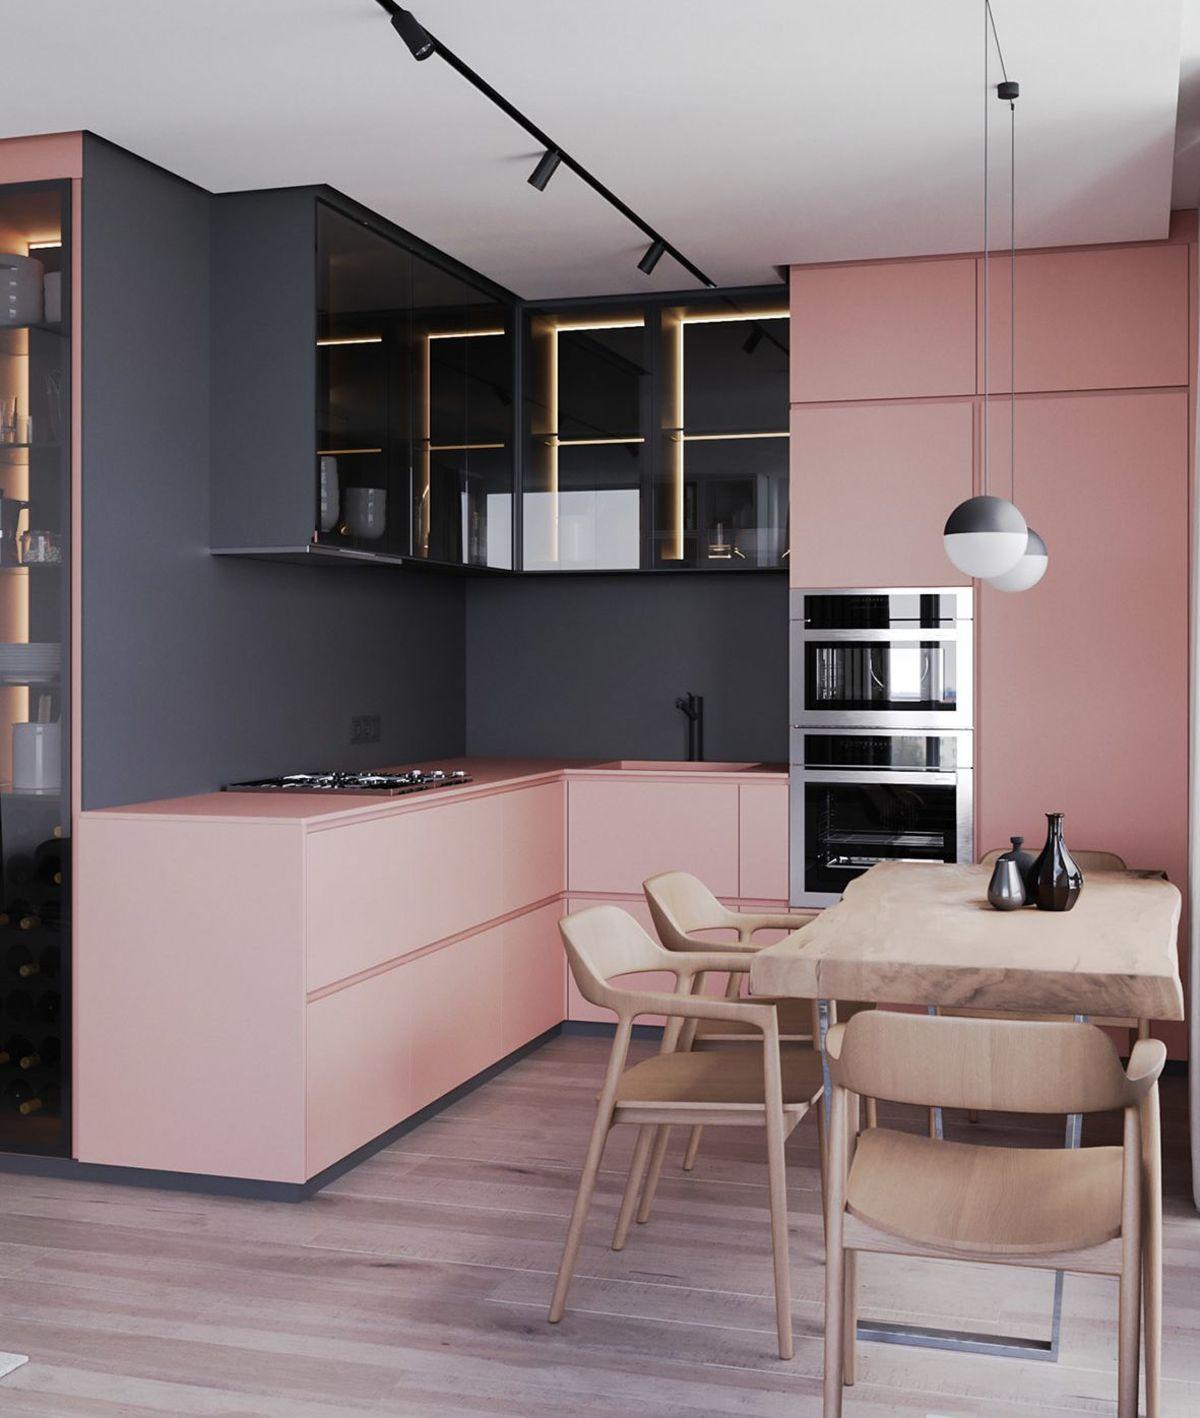 Cucina ad angolo - design di Ruslan Kovalchuk, Mariya Chmut e Stephen Tsimbalyuk